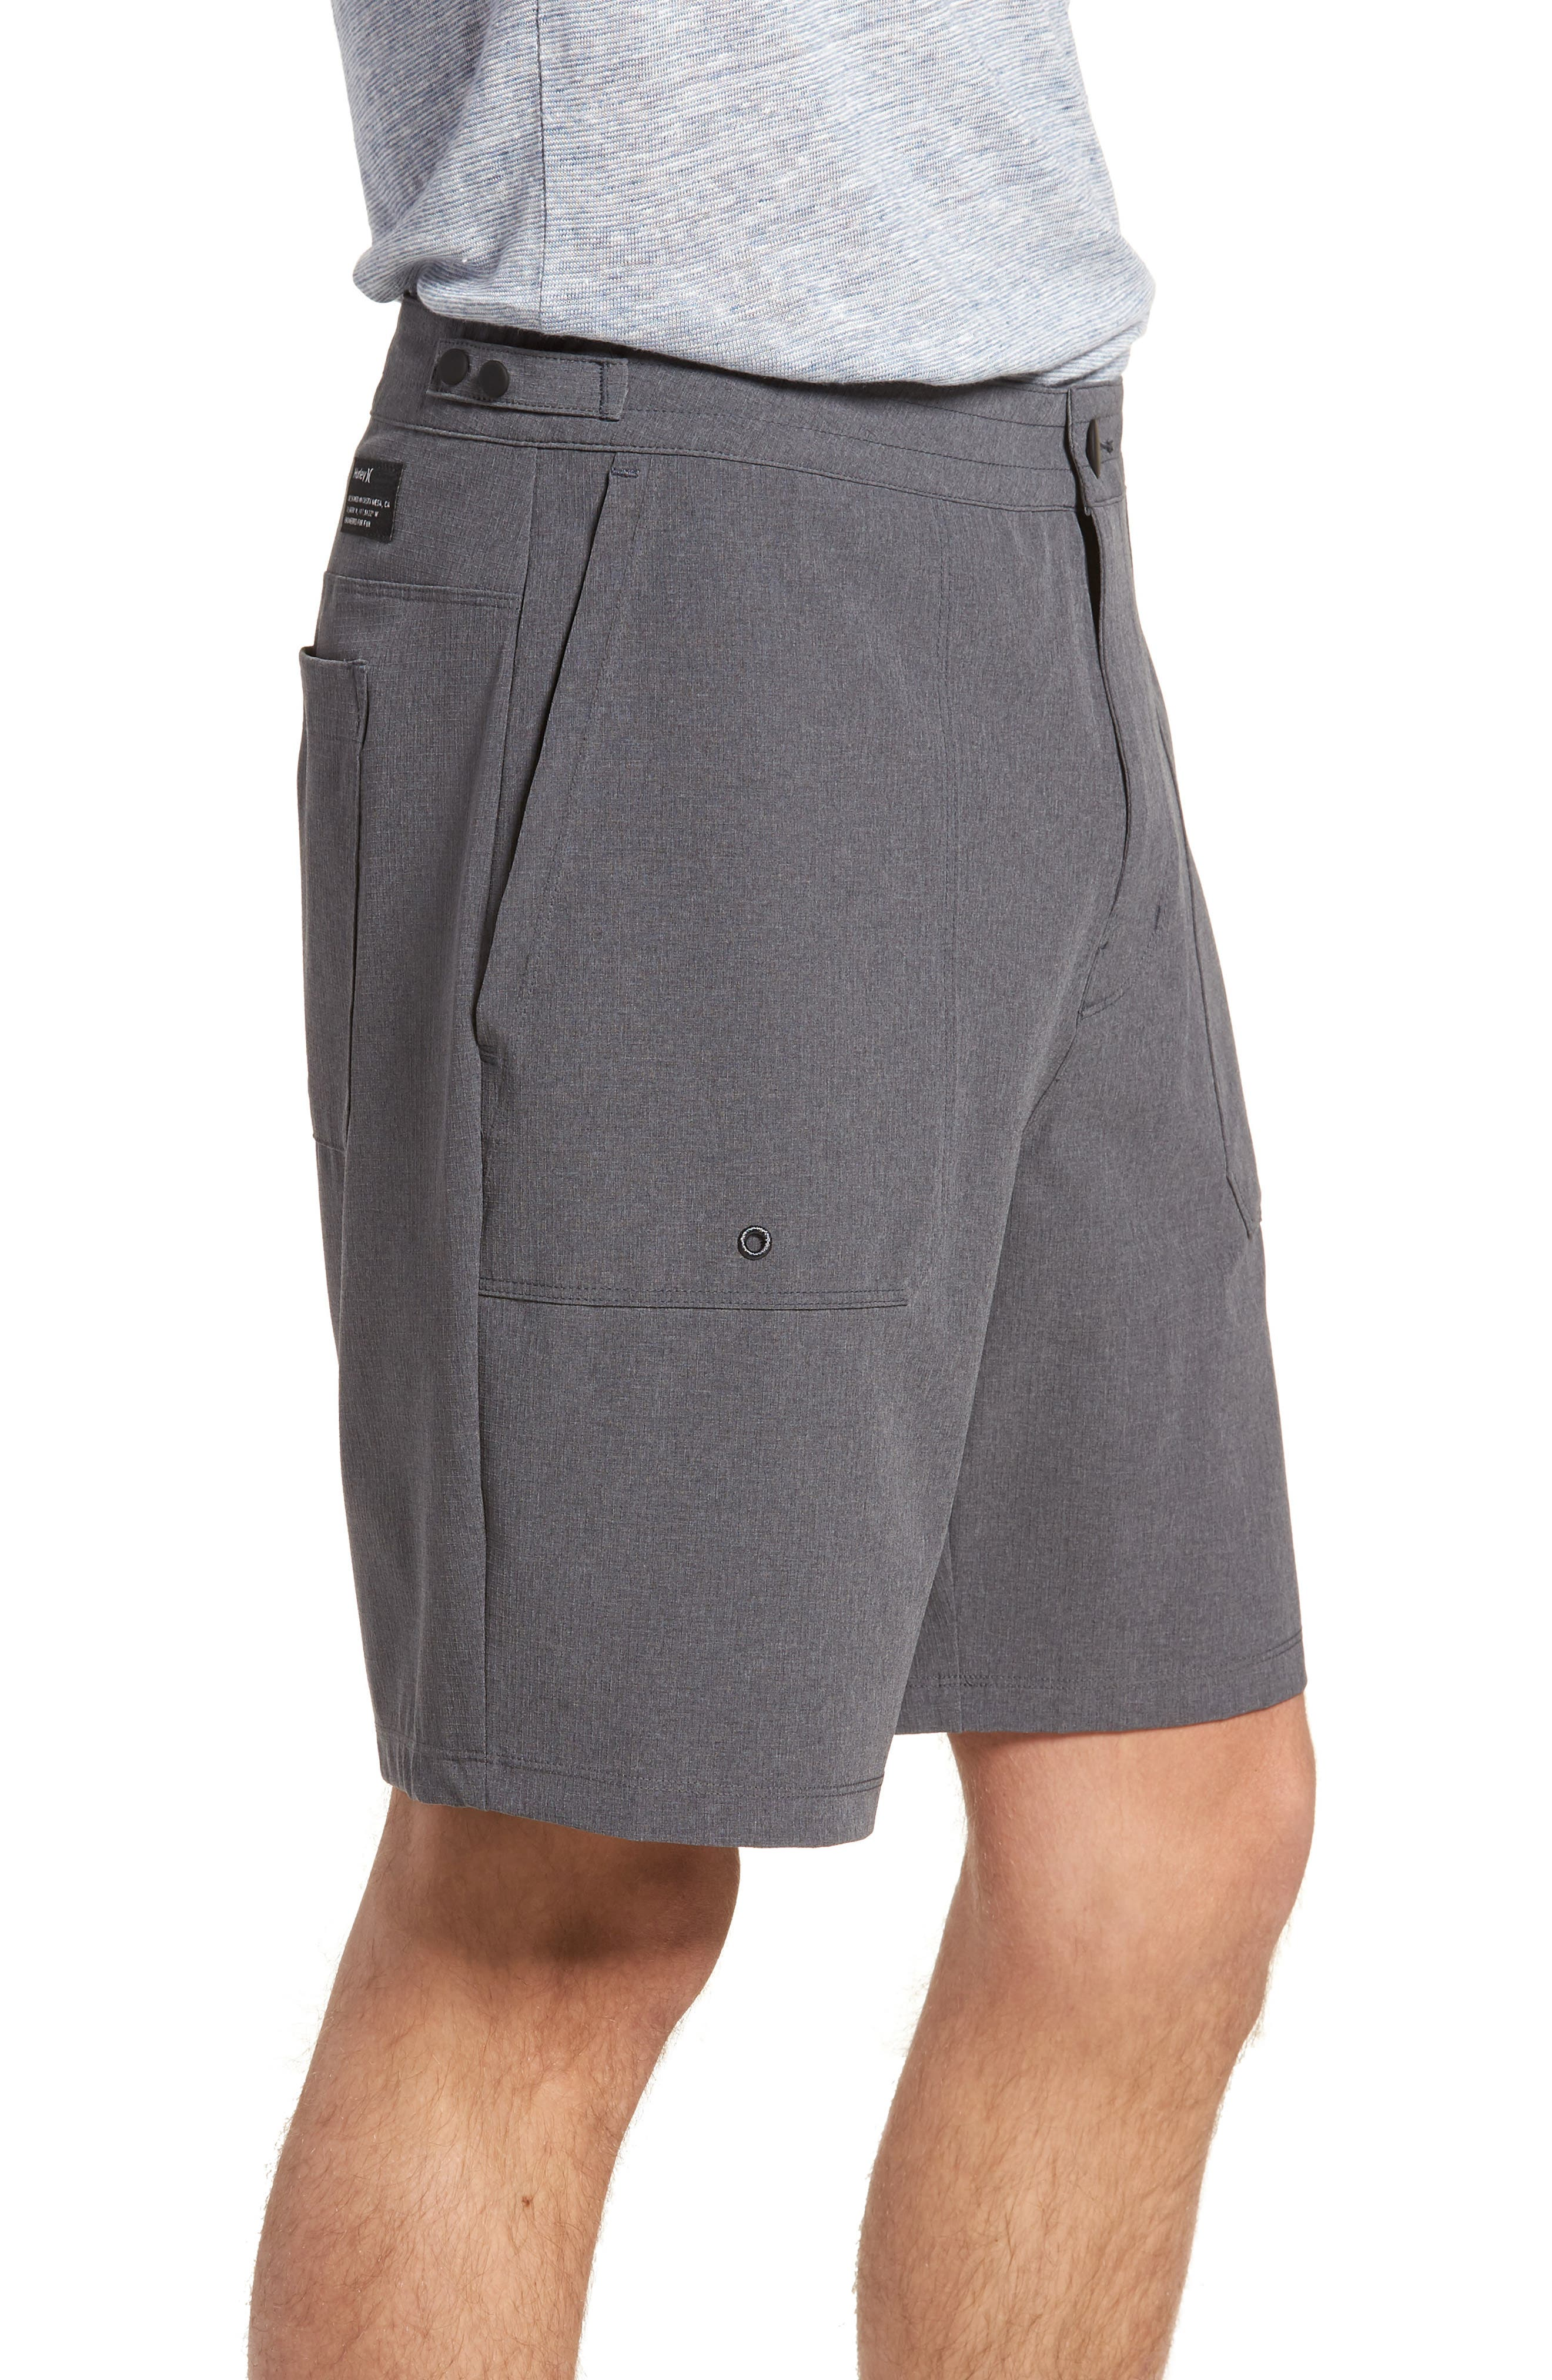 Phantom Coastline Shorts,                             Alternate thumbnail 3, color,                             Black Heather